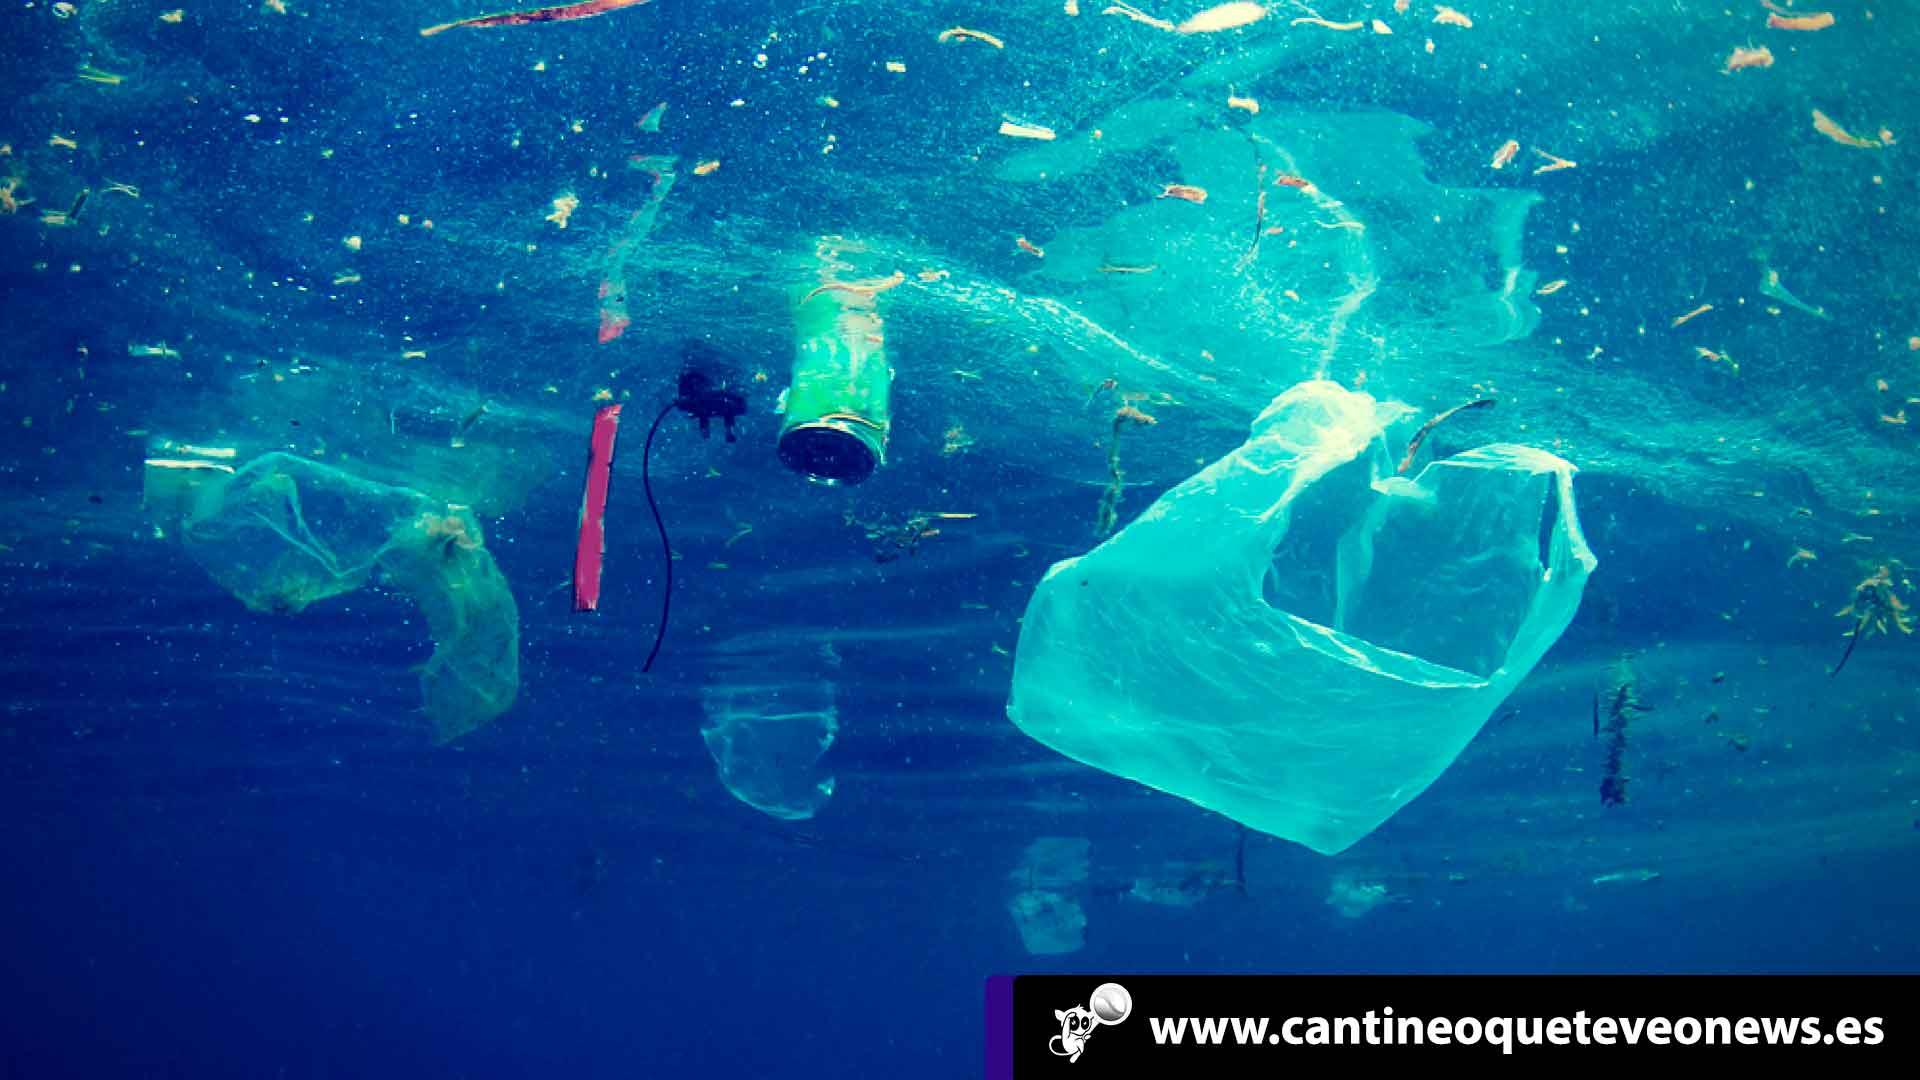 Cantineoqueteveo News - Contaminacion Plástica